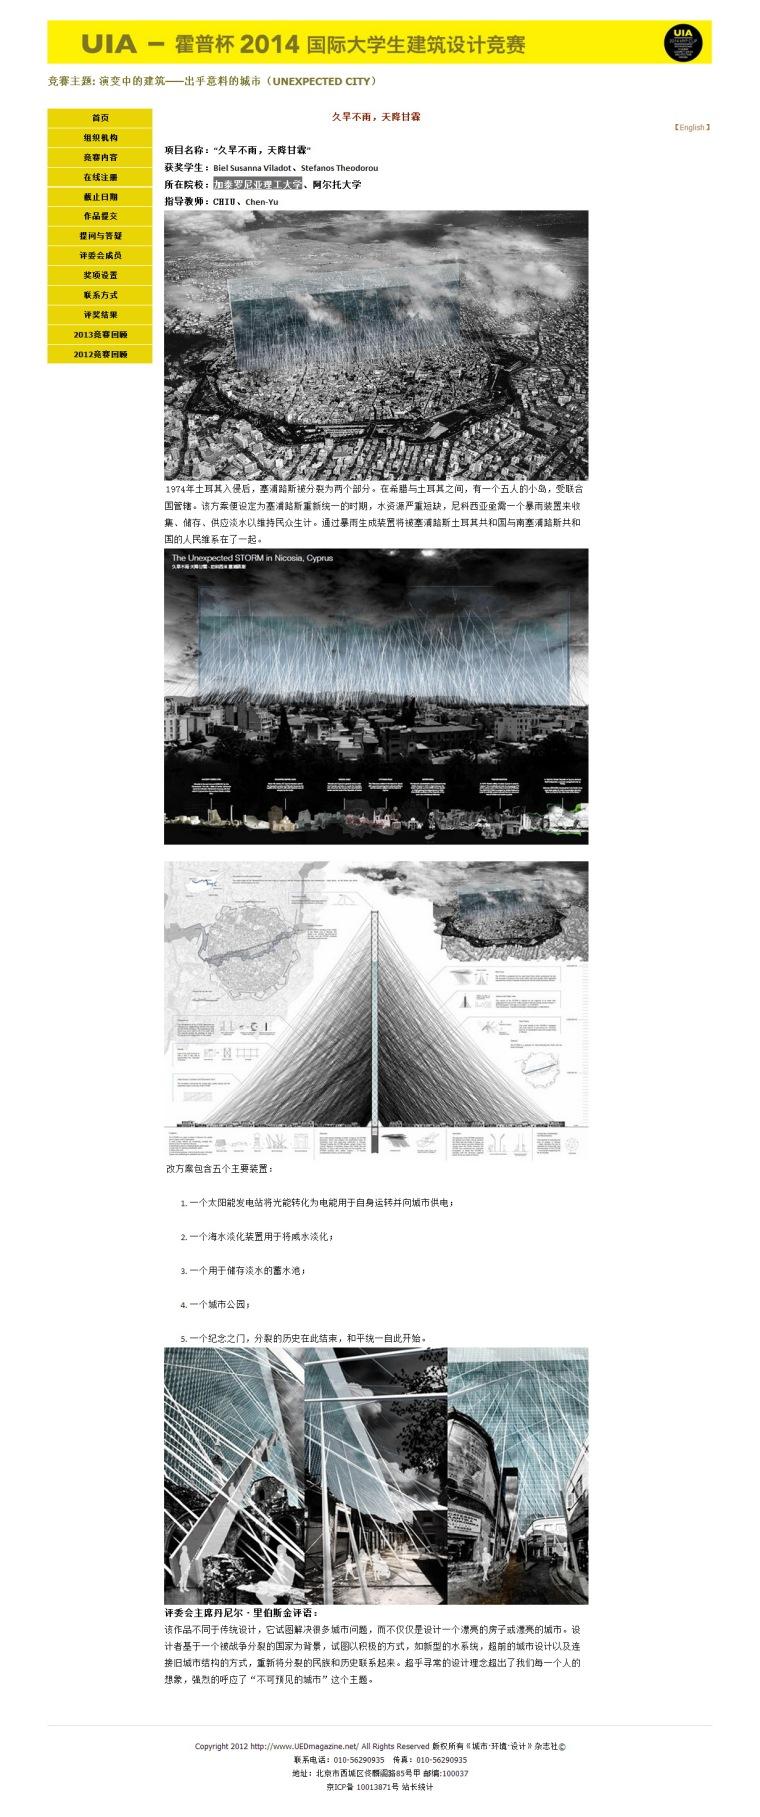 IFLA获奖作品集合资料下载-2014霍普杯获奖作品(普清)